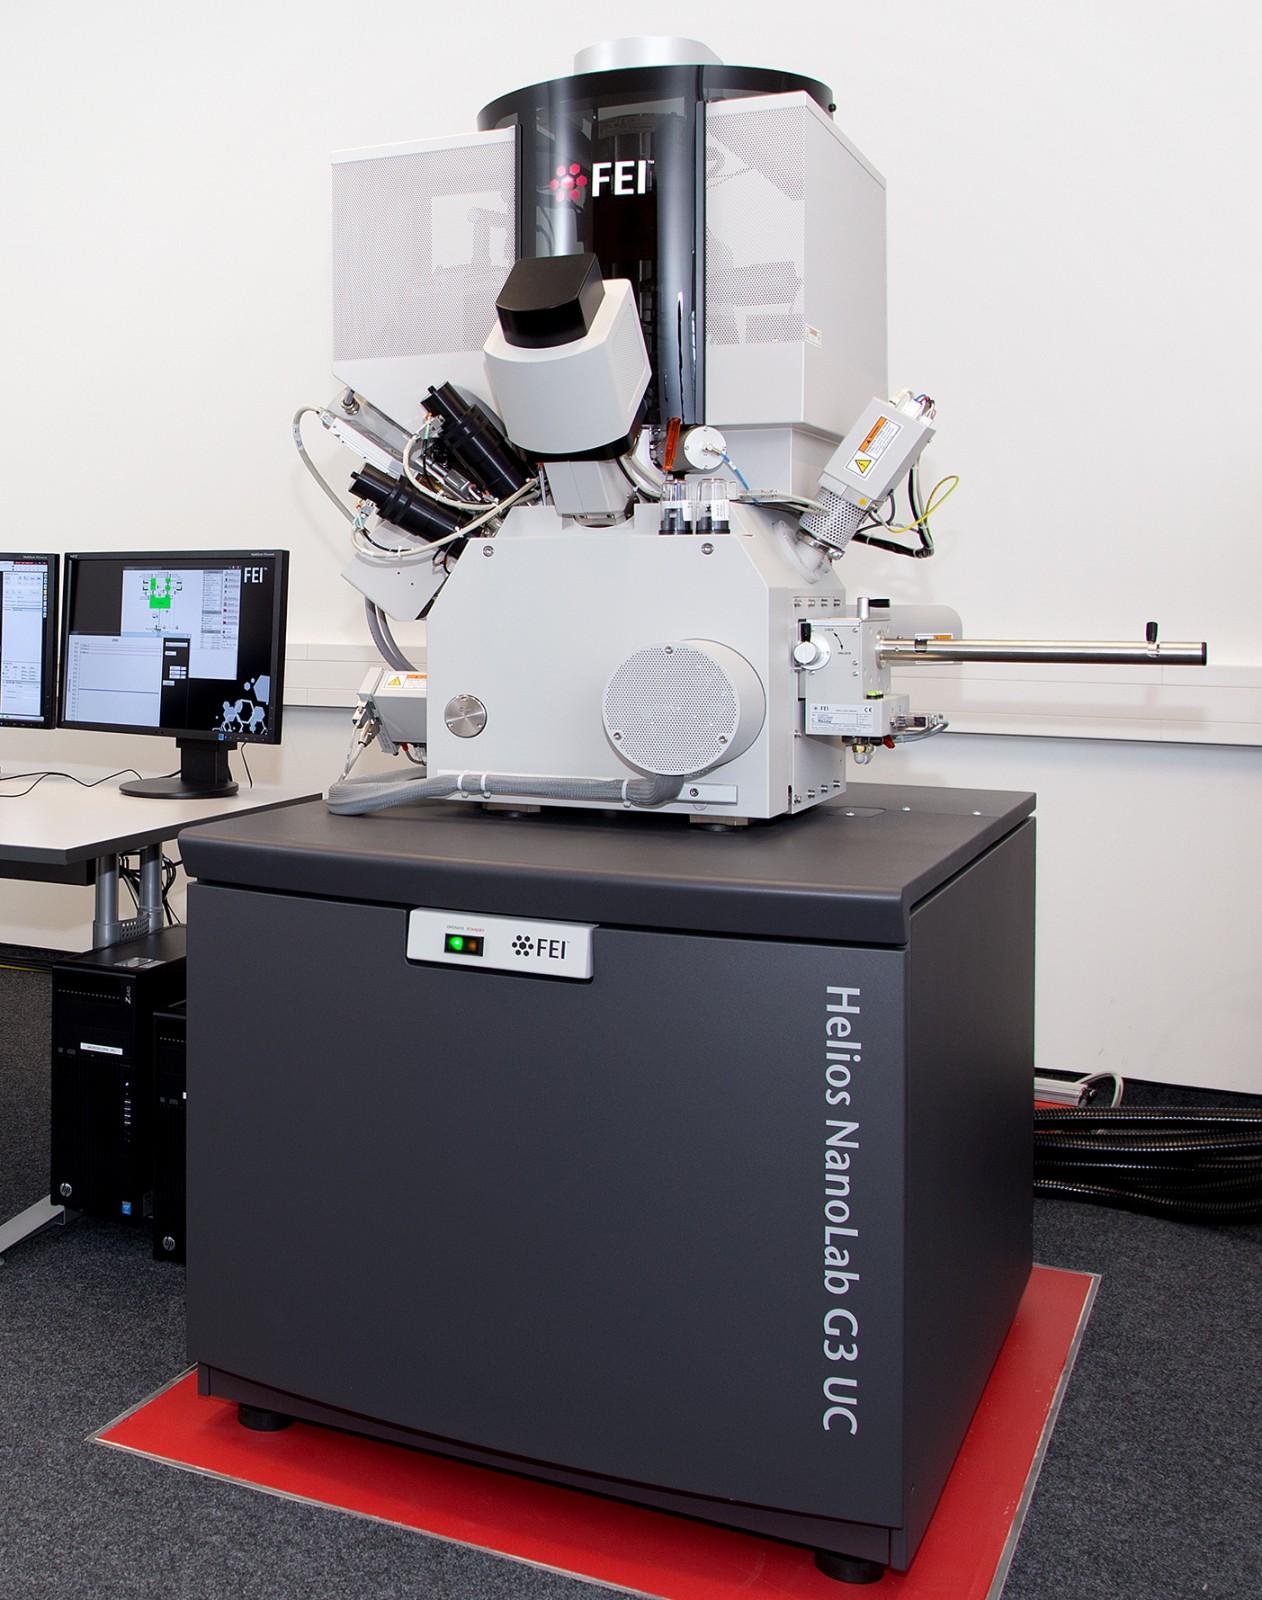 raeume-elektronenmikroskopie-tu-hamburg-harburg-mikroskop-helios